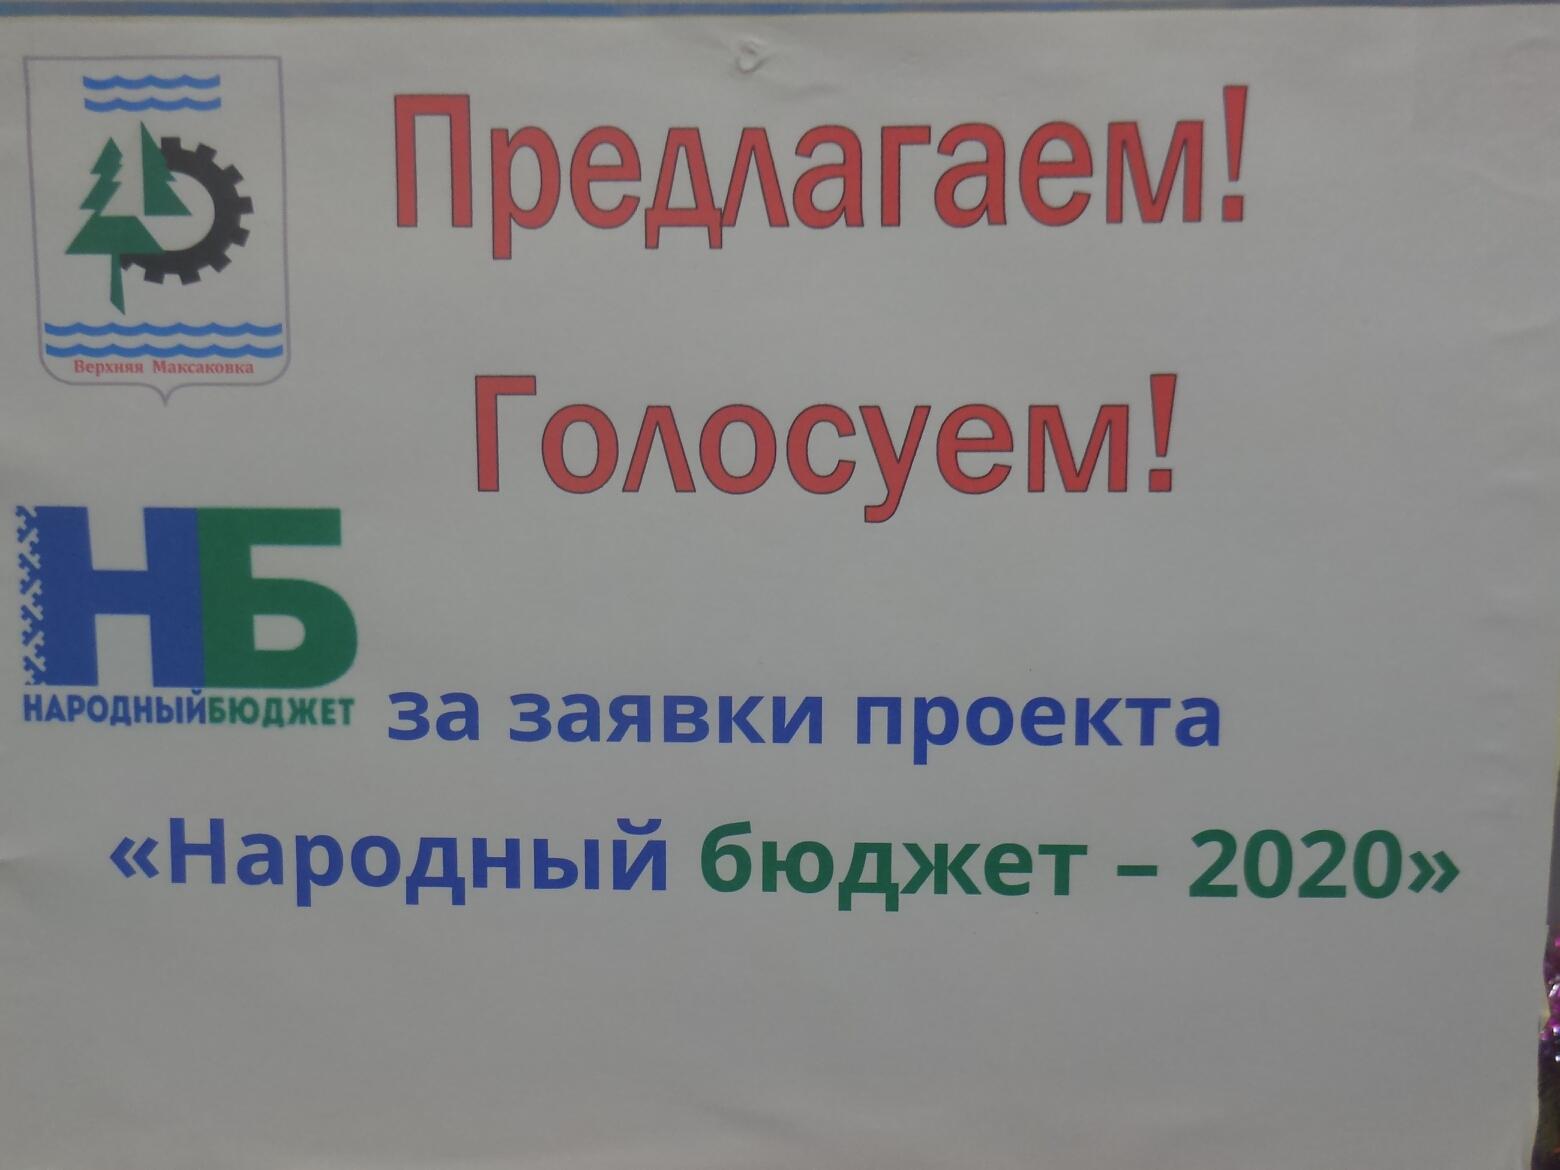 Sbor-predl-i-Maksakovaka-NB19-20_2.jpg